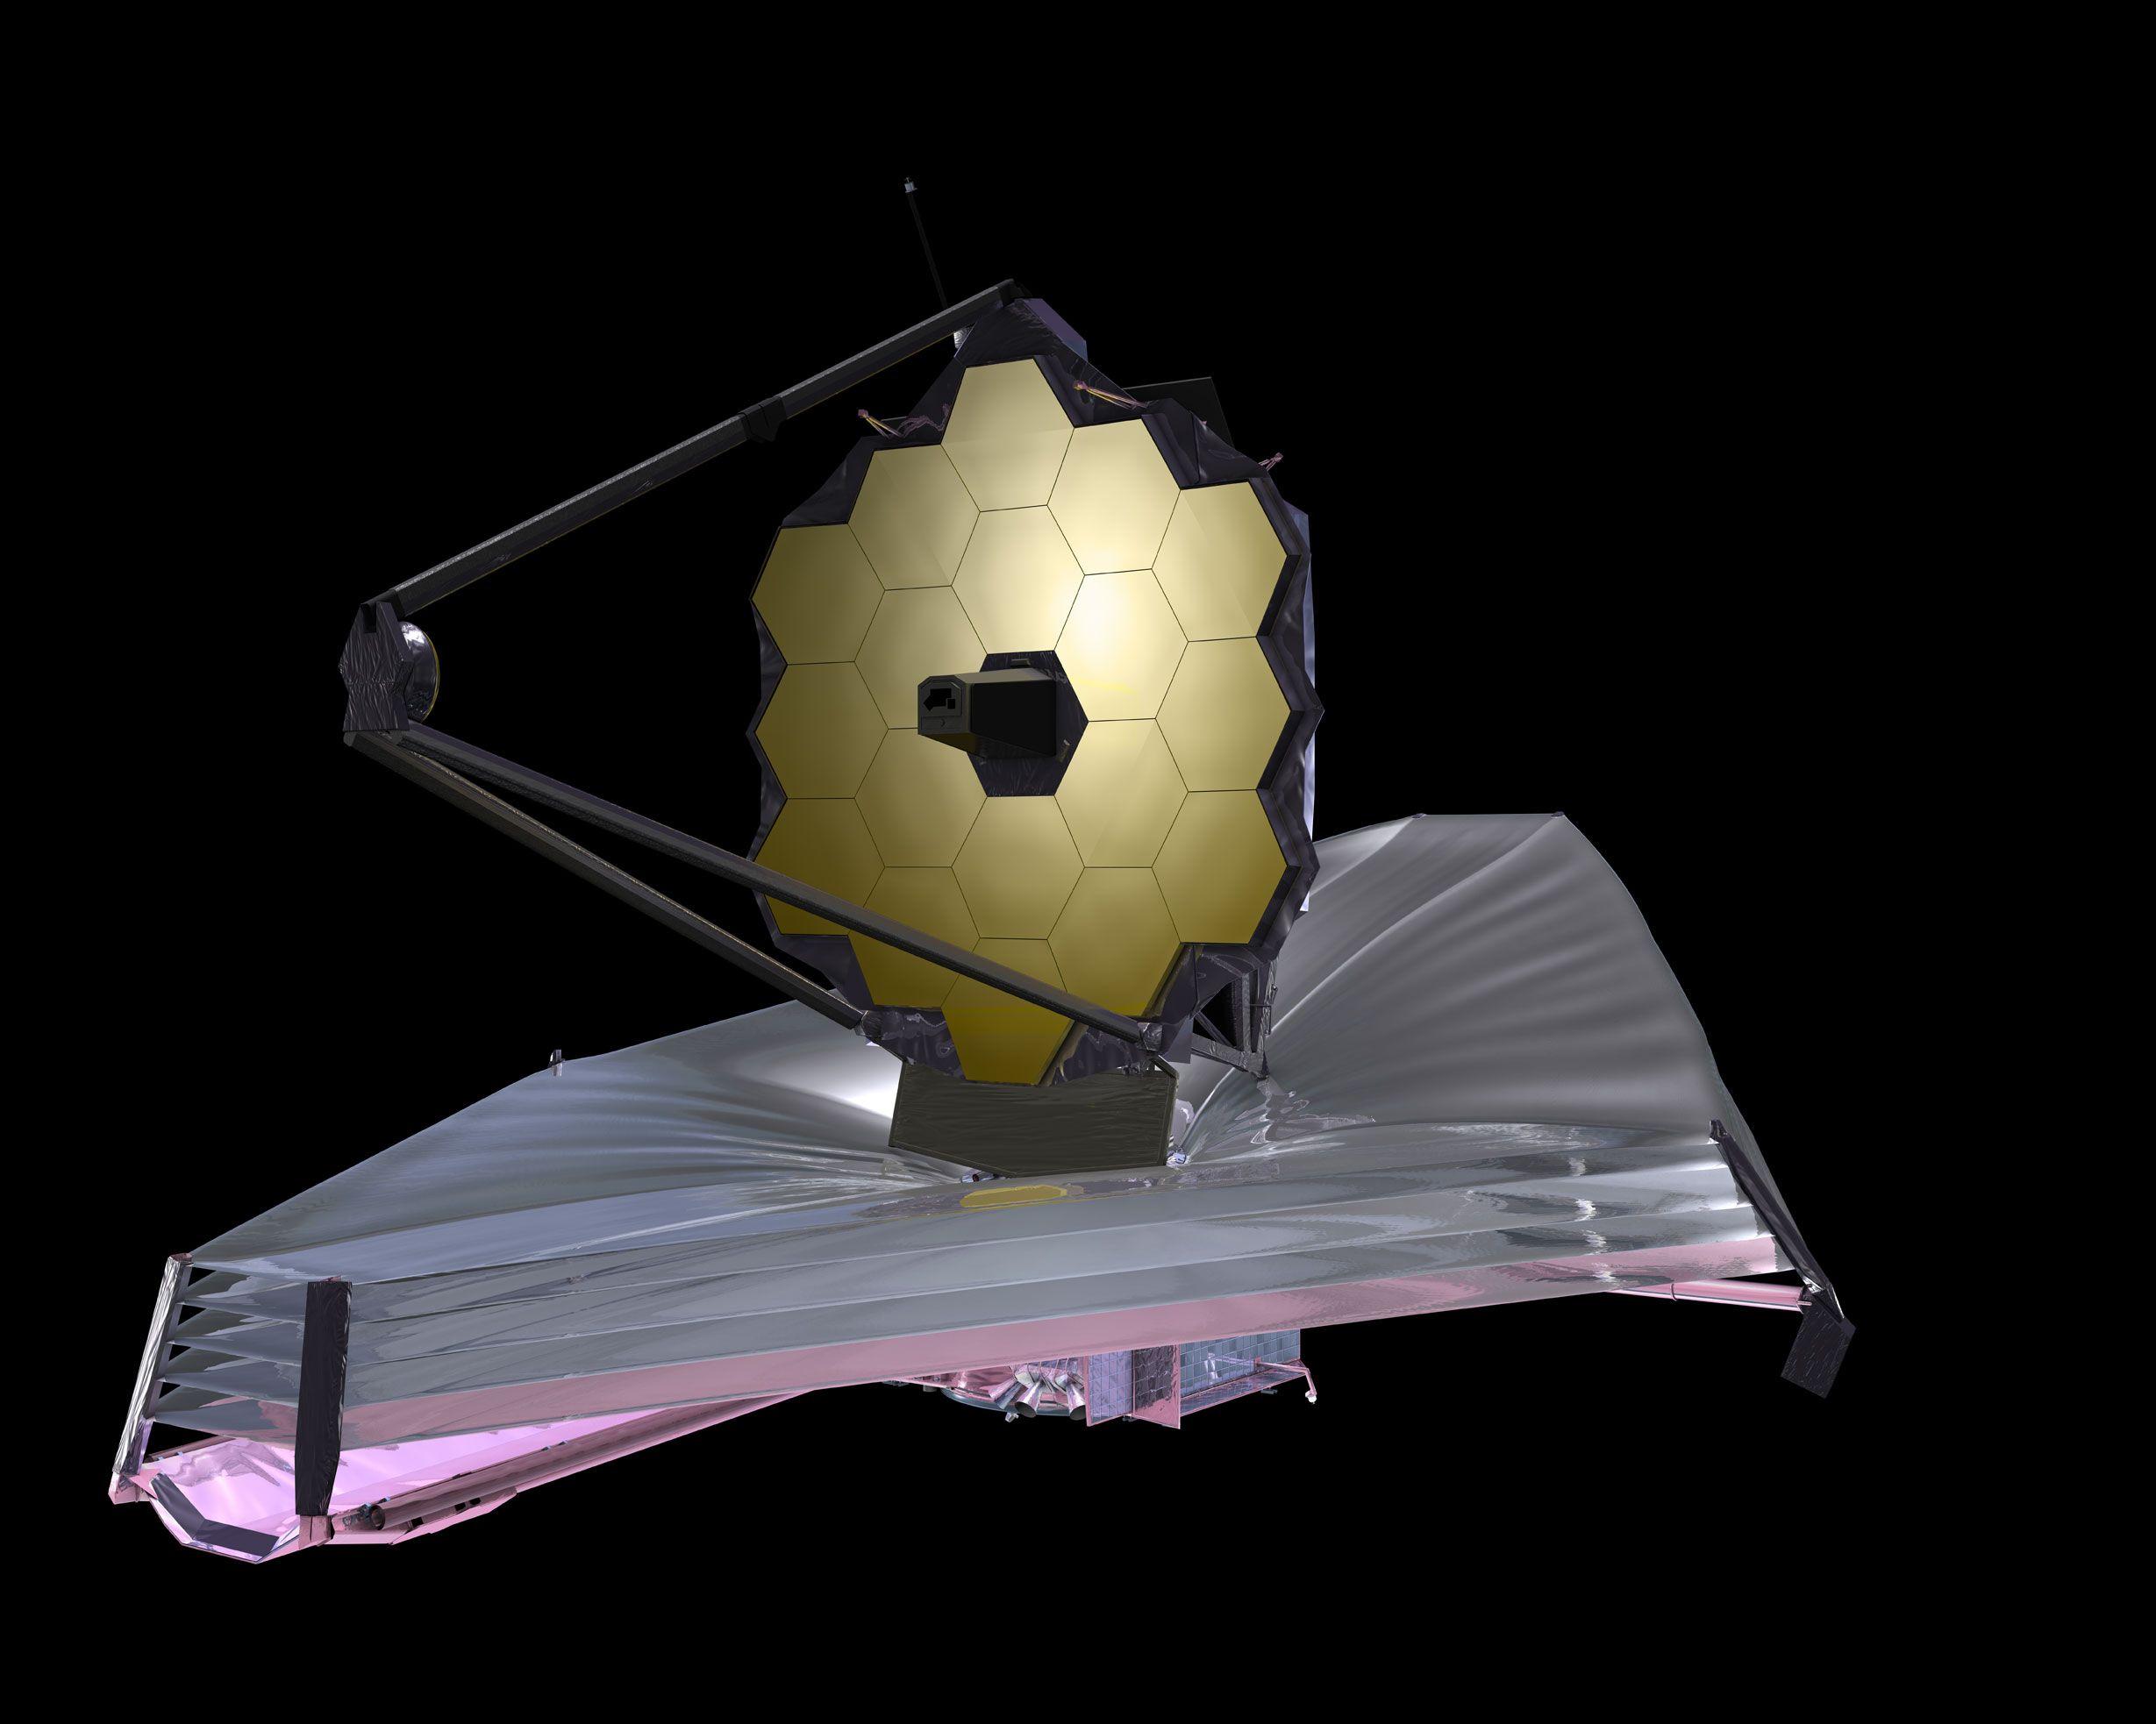 09_29_james webb telescope